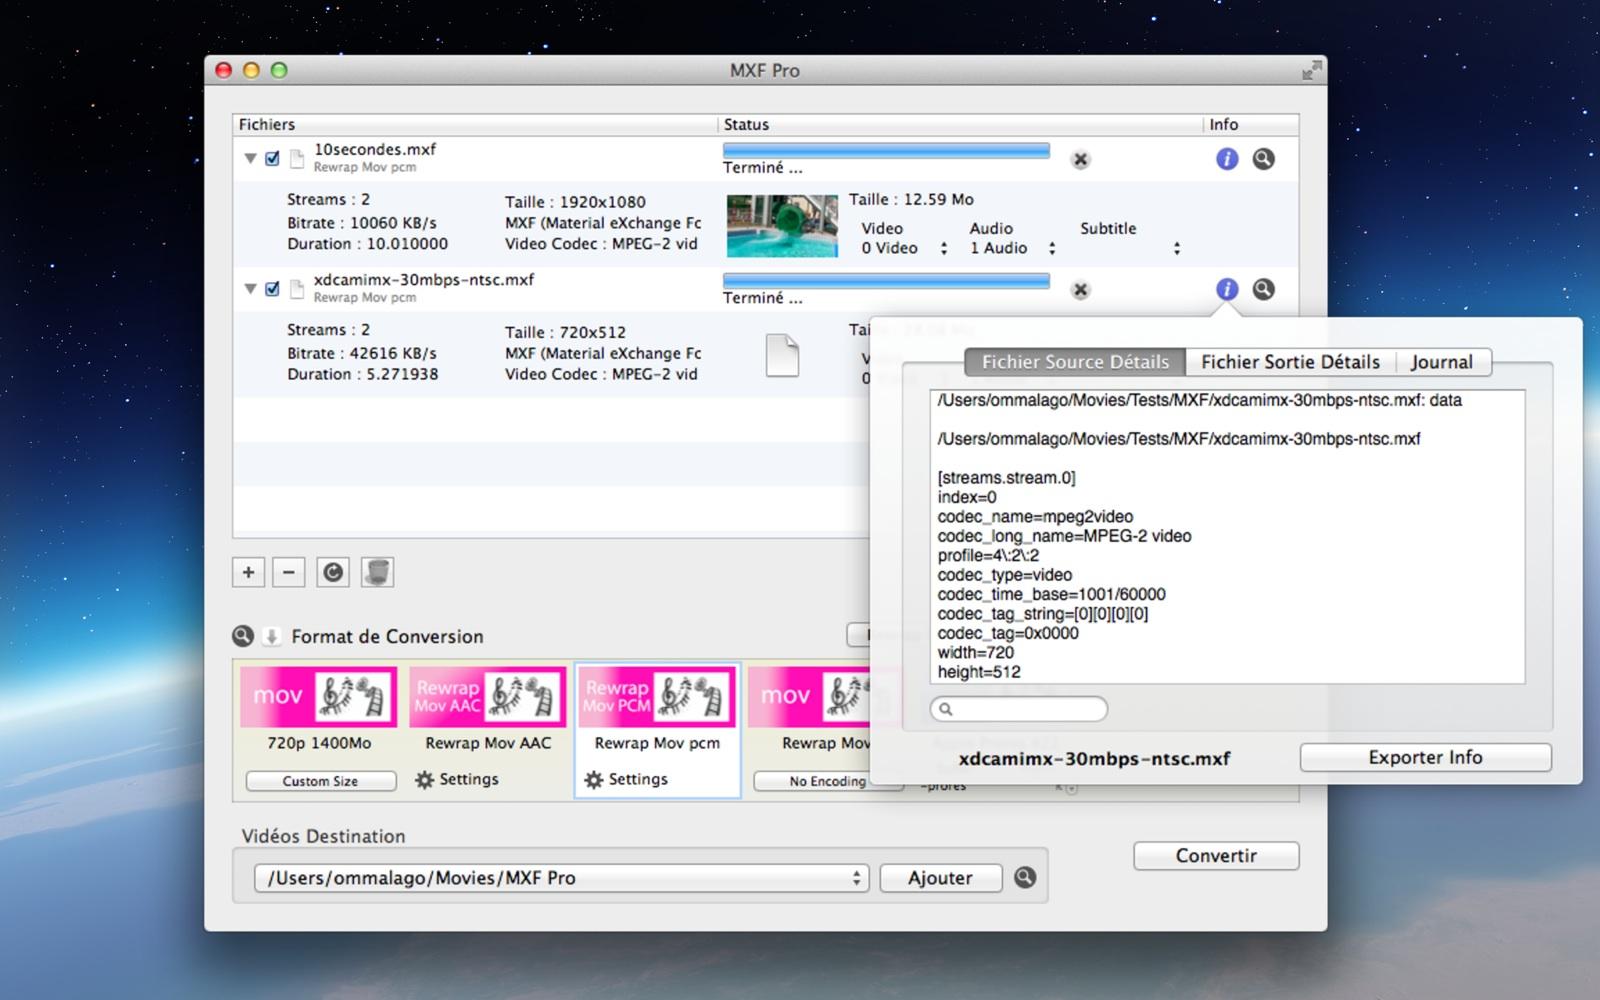 Torchsoft ascii art studio v2.2.1keygen patch brd h33tmambo04